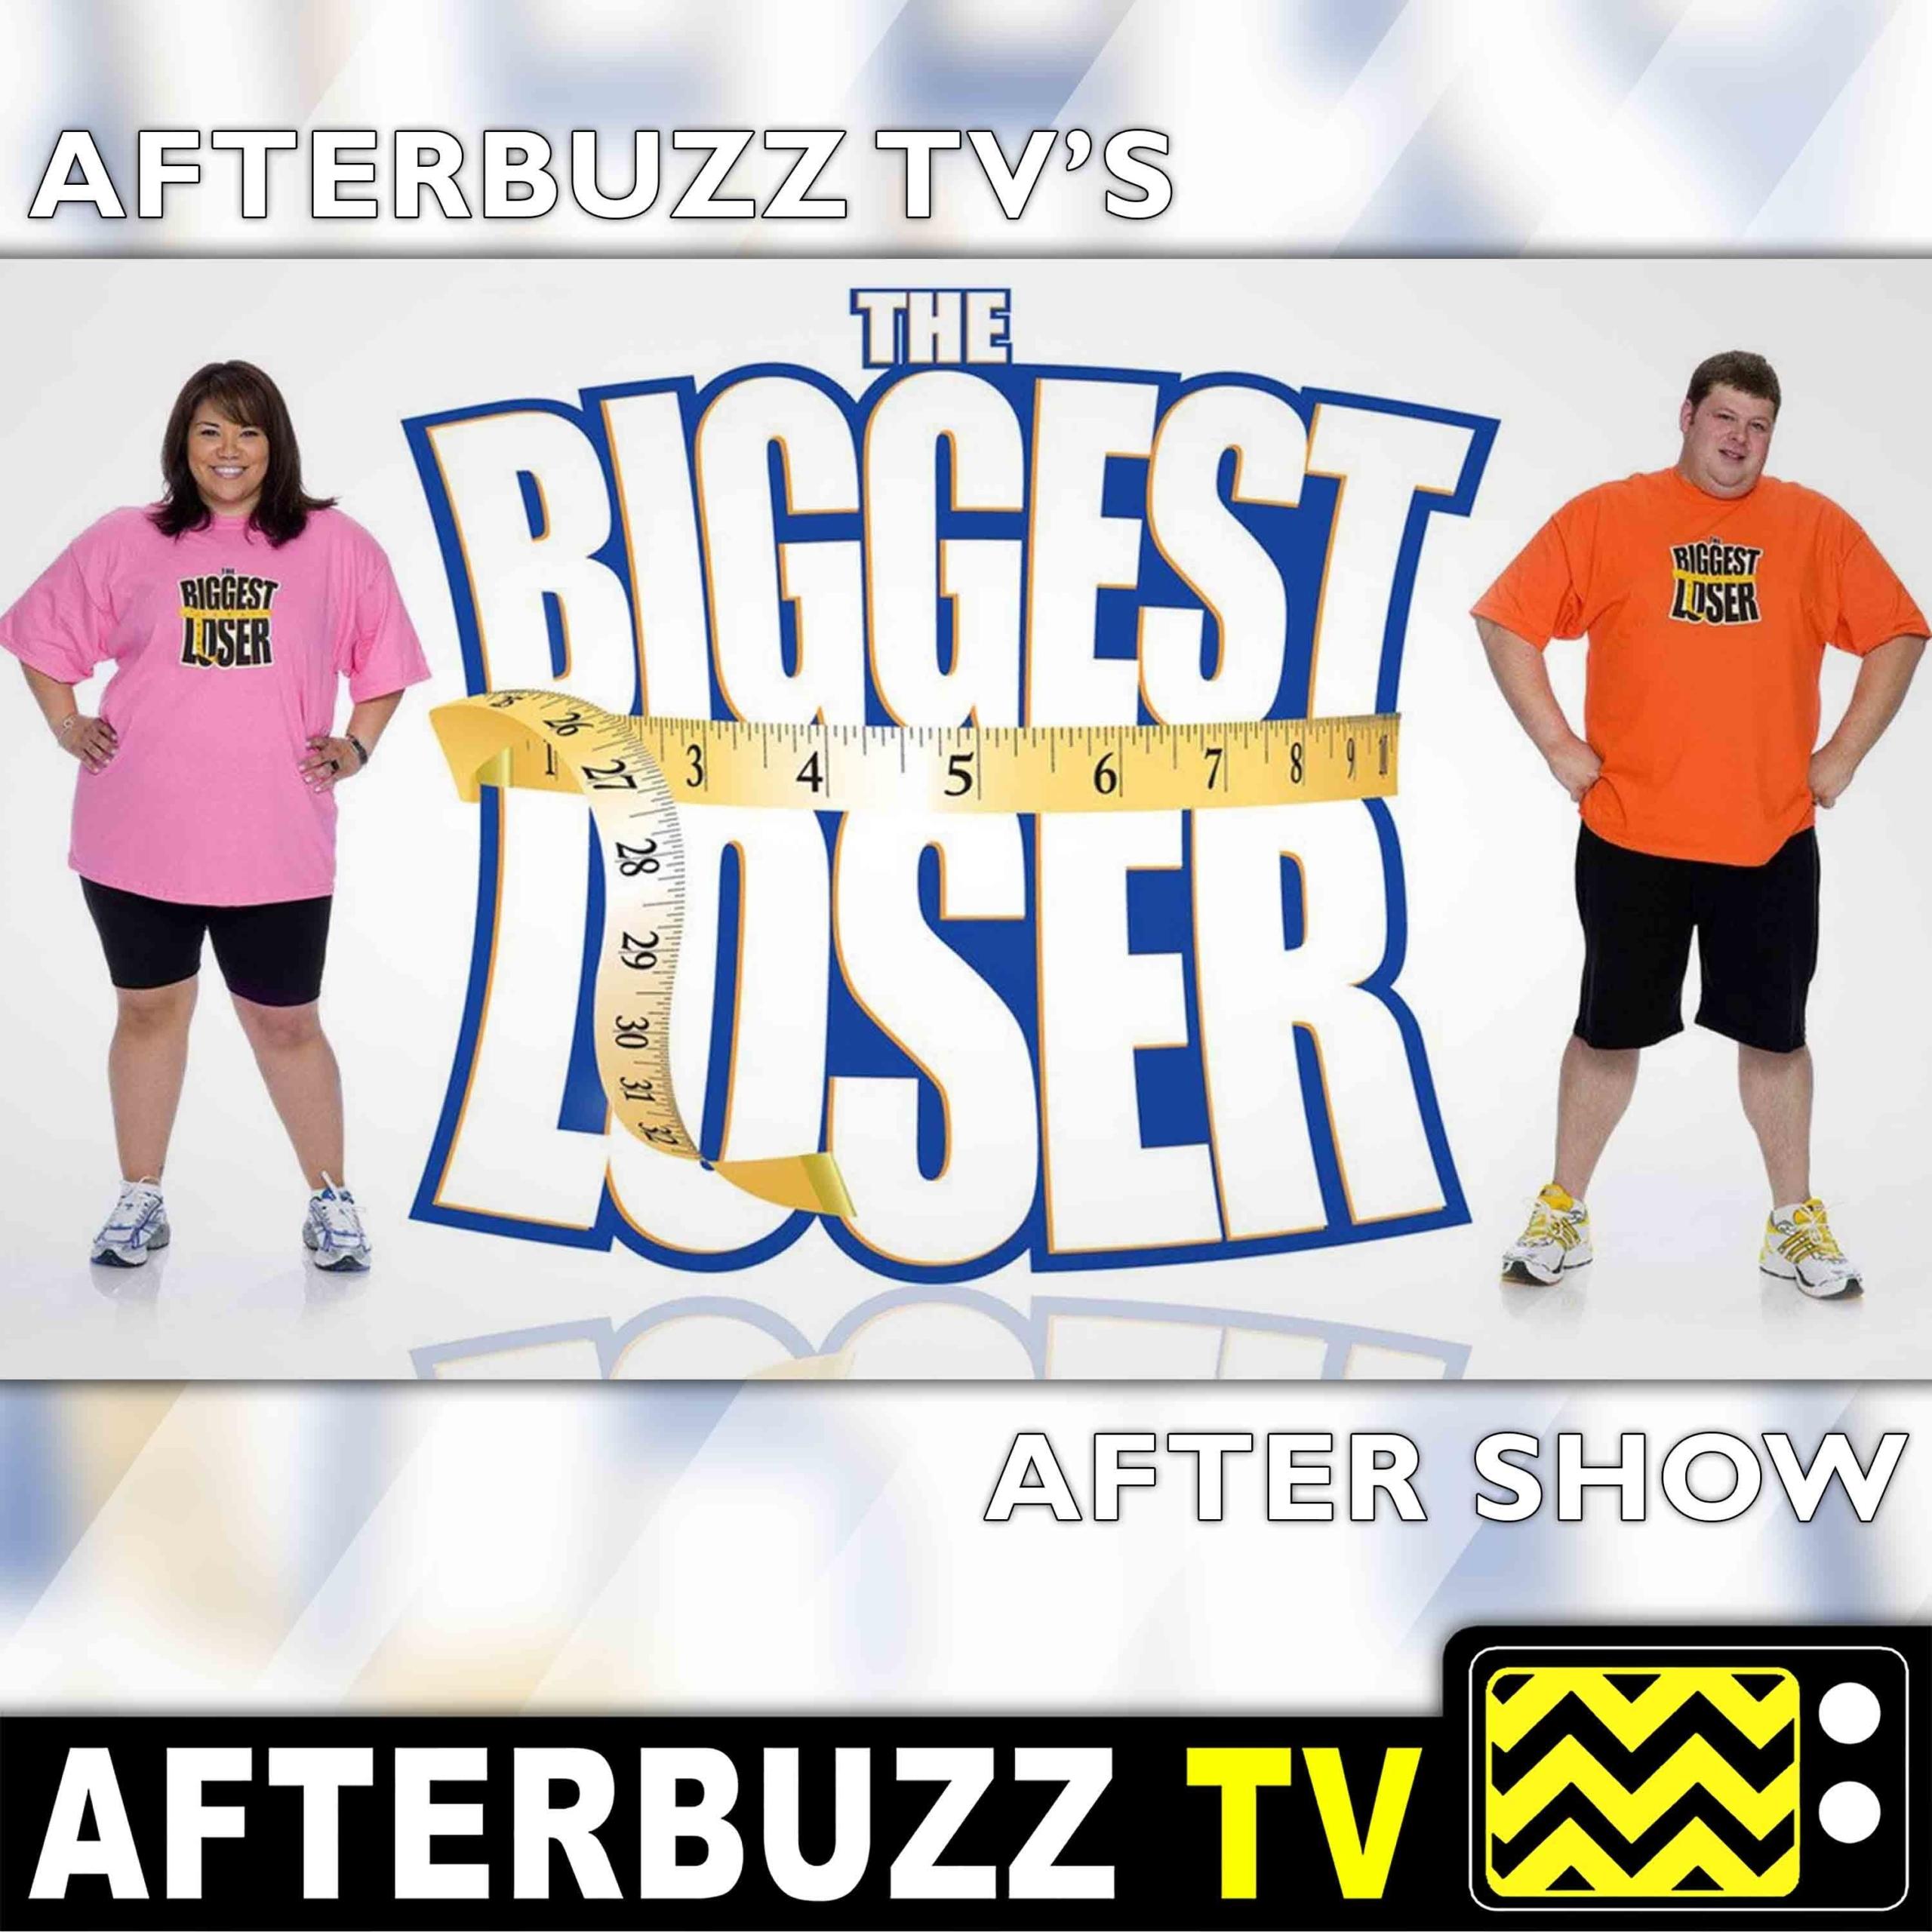 The Biggest Loser S:17 | Alexander DelaCruz Guests on Live Finale E:8 | AfterBuzz TV AfterShow